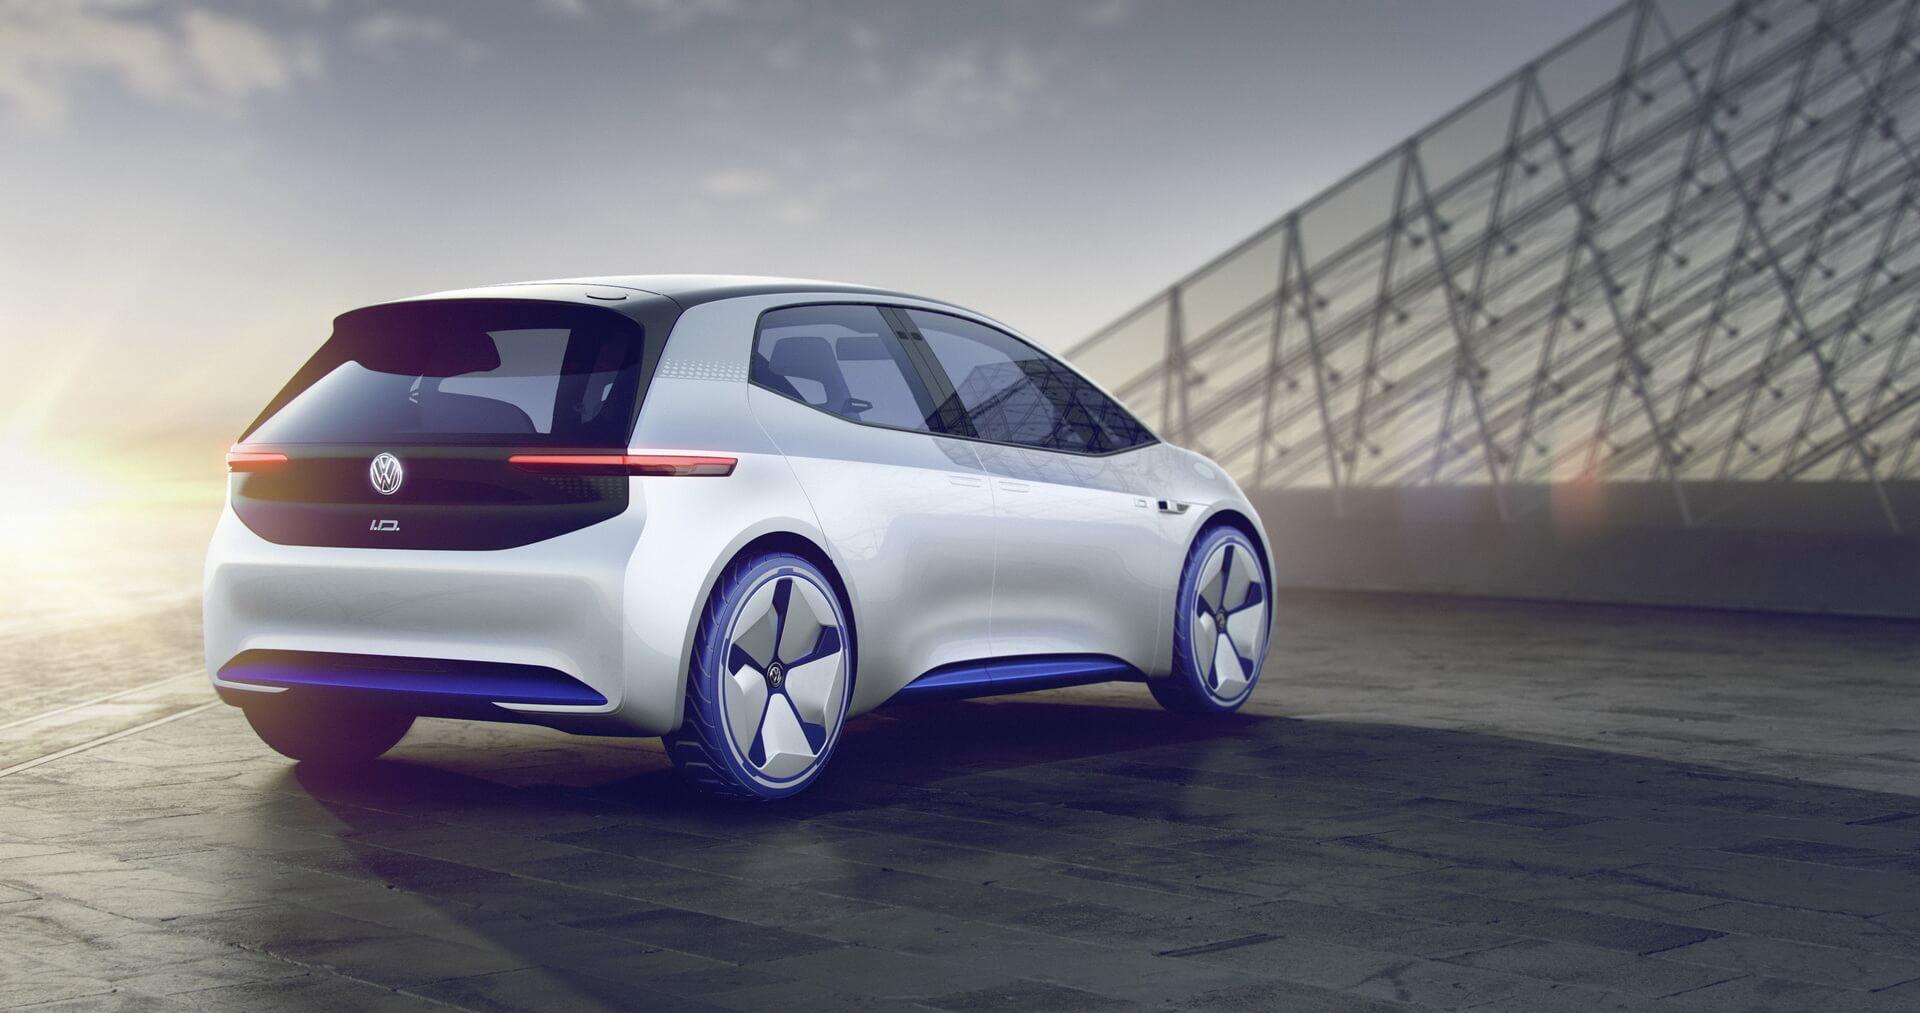 Задняя оптика Volkswagen I.D.